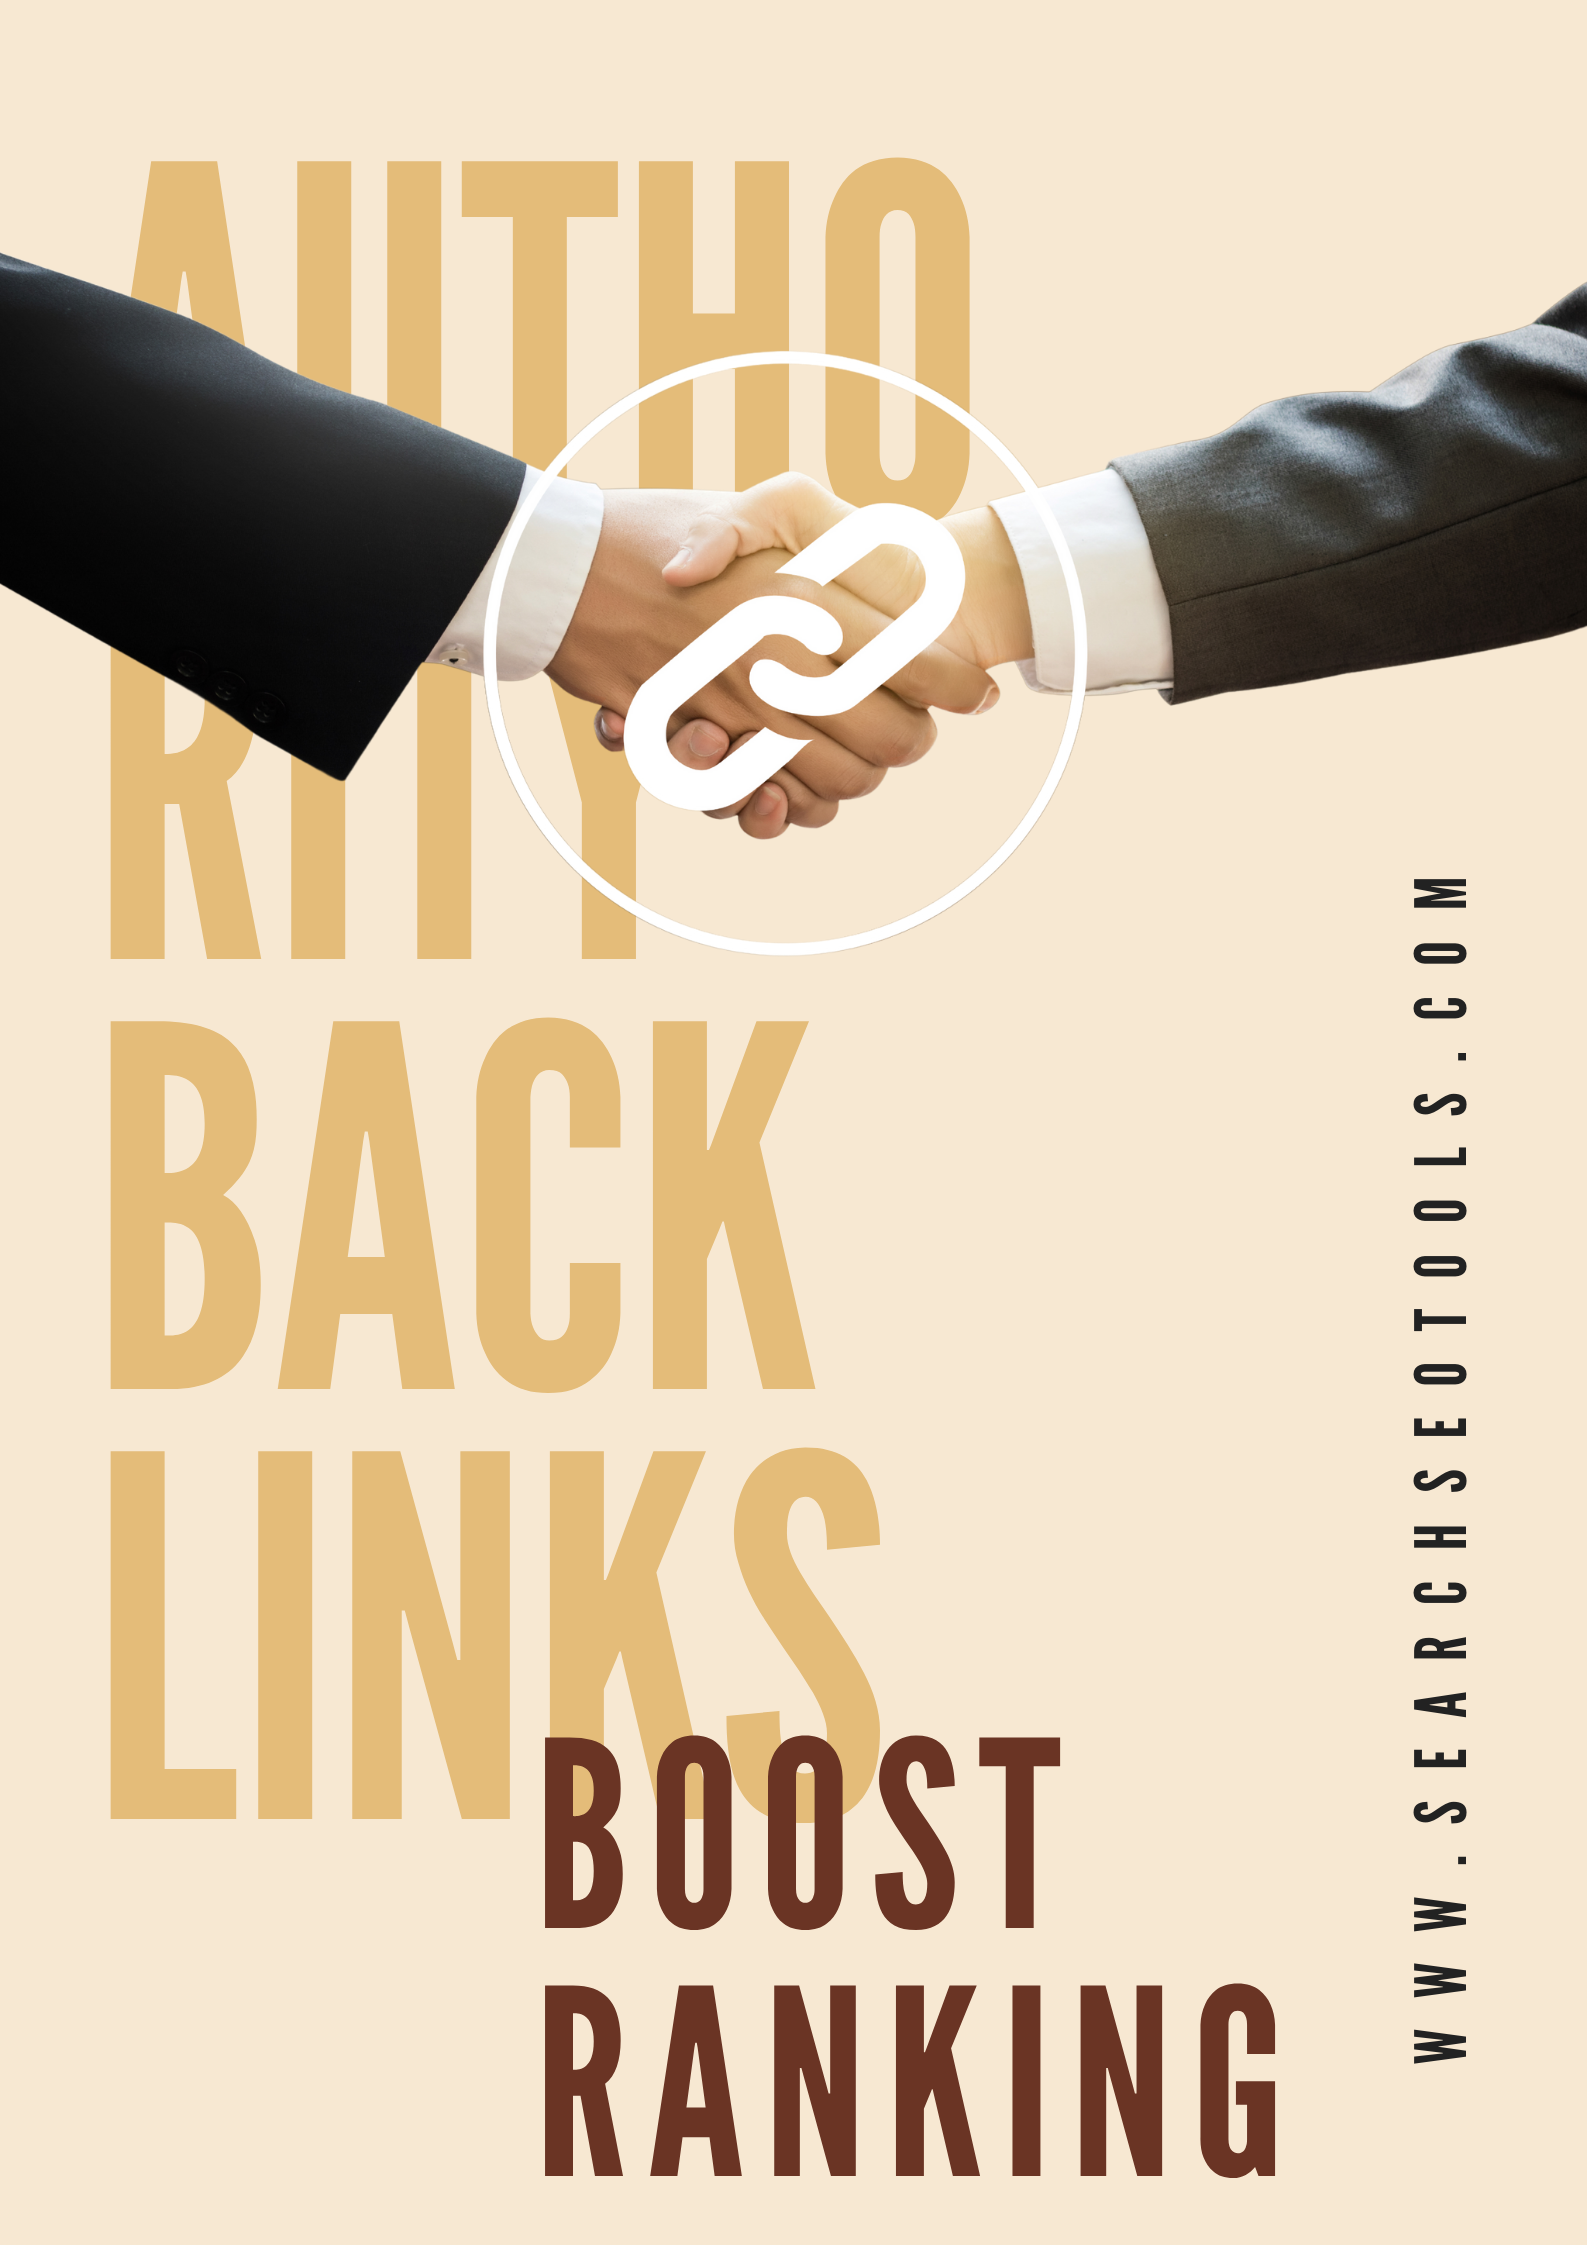 Authoritative Backlinks - boost website traffic